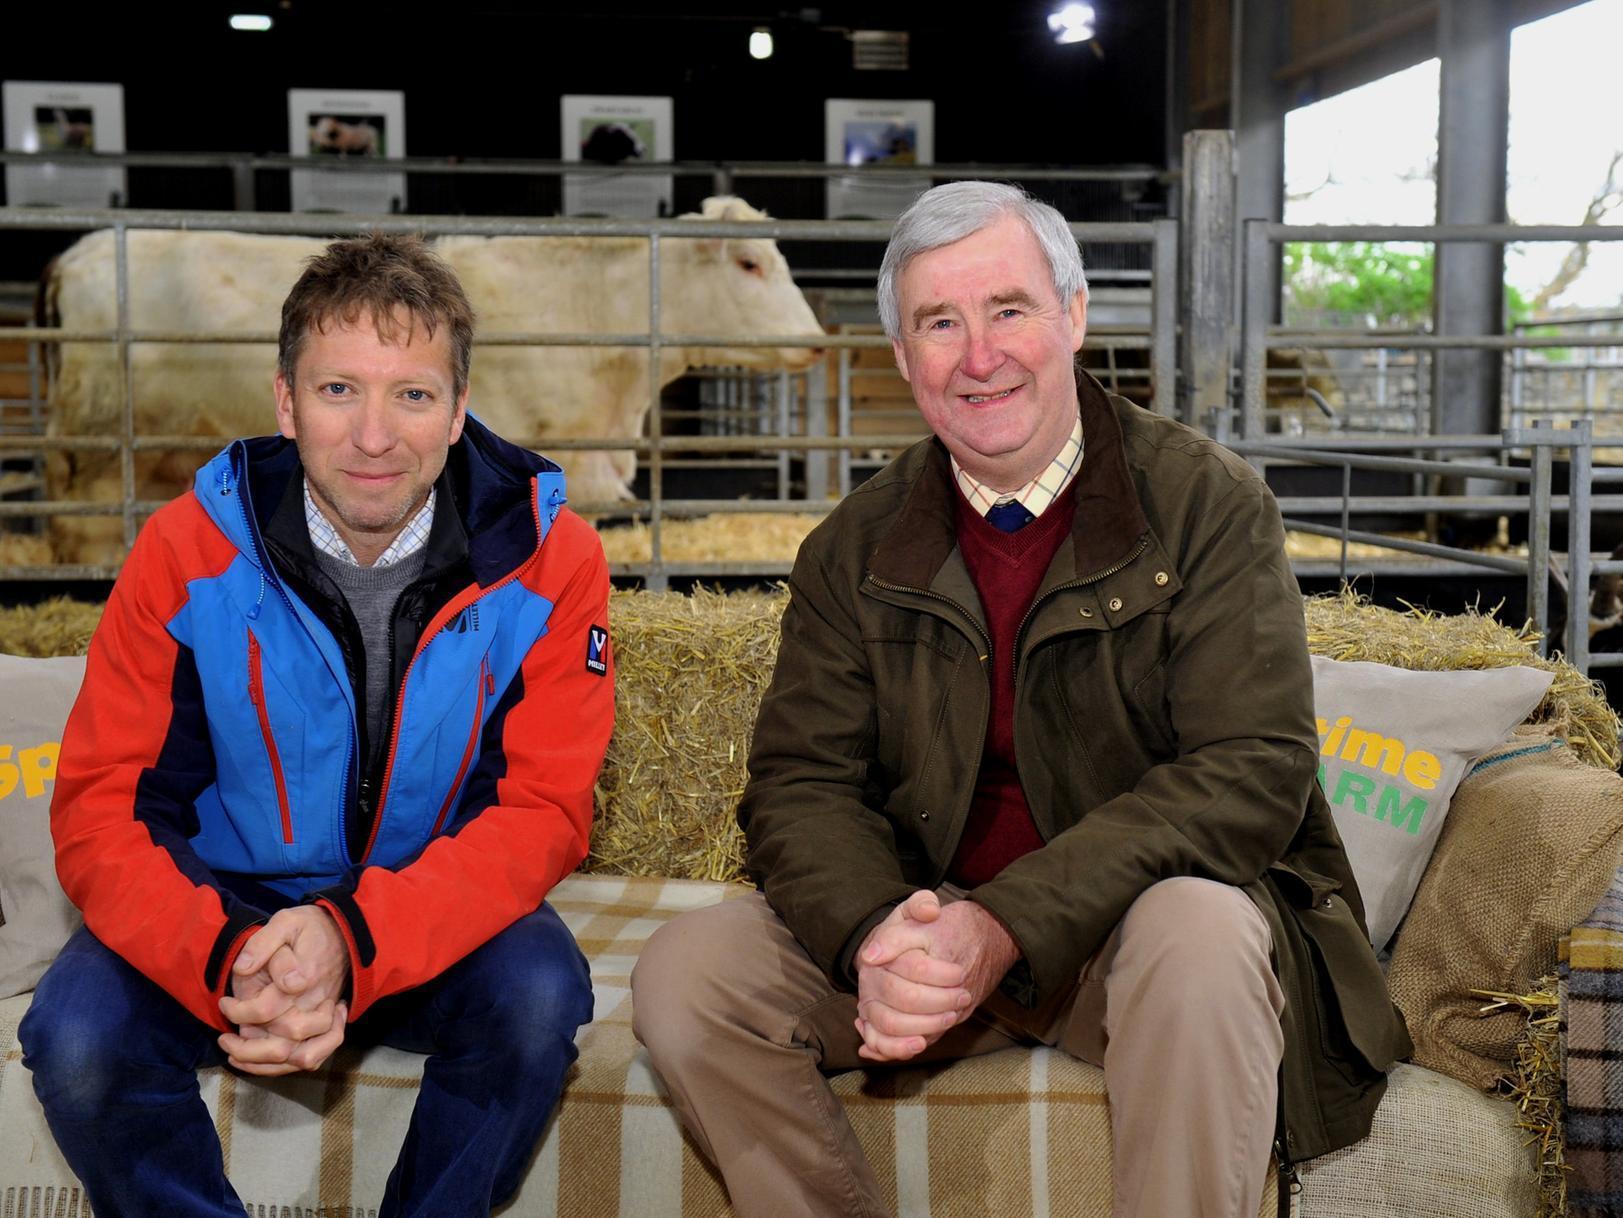 Yorkshire Vet stars Peter Wright and Julian Norton speak ahead of series 10